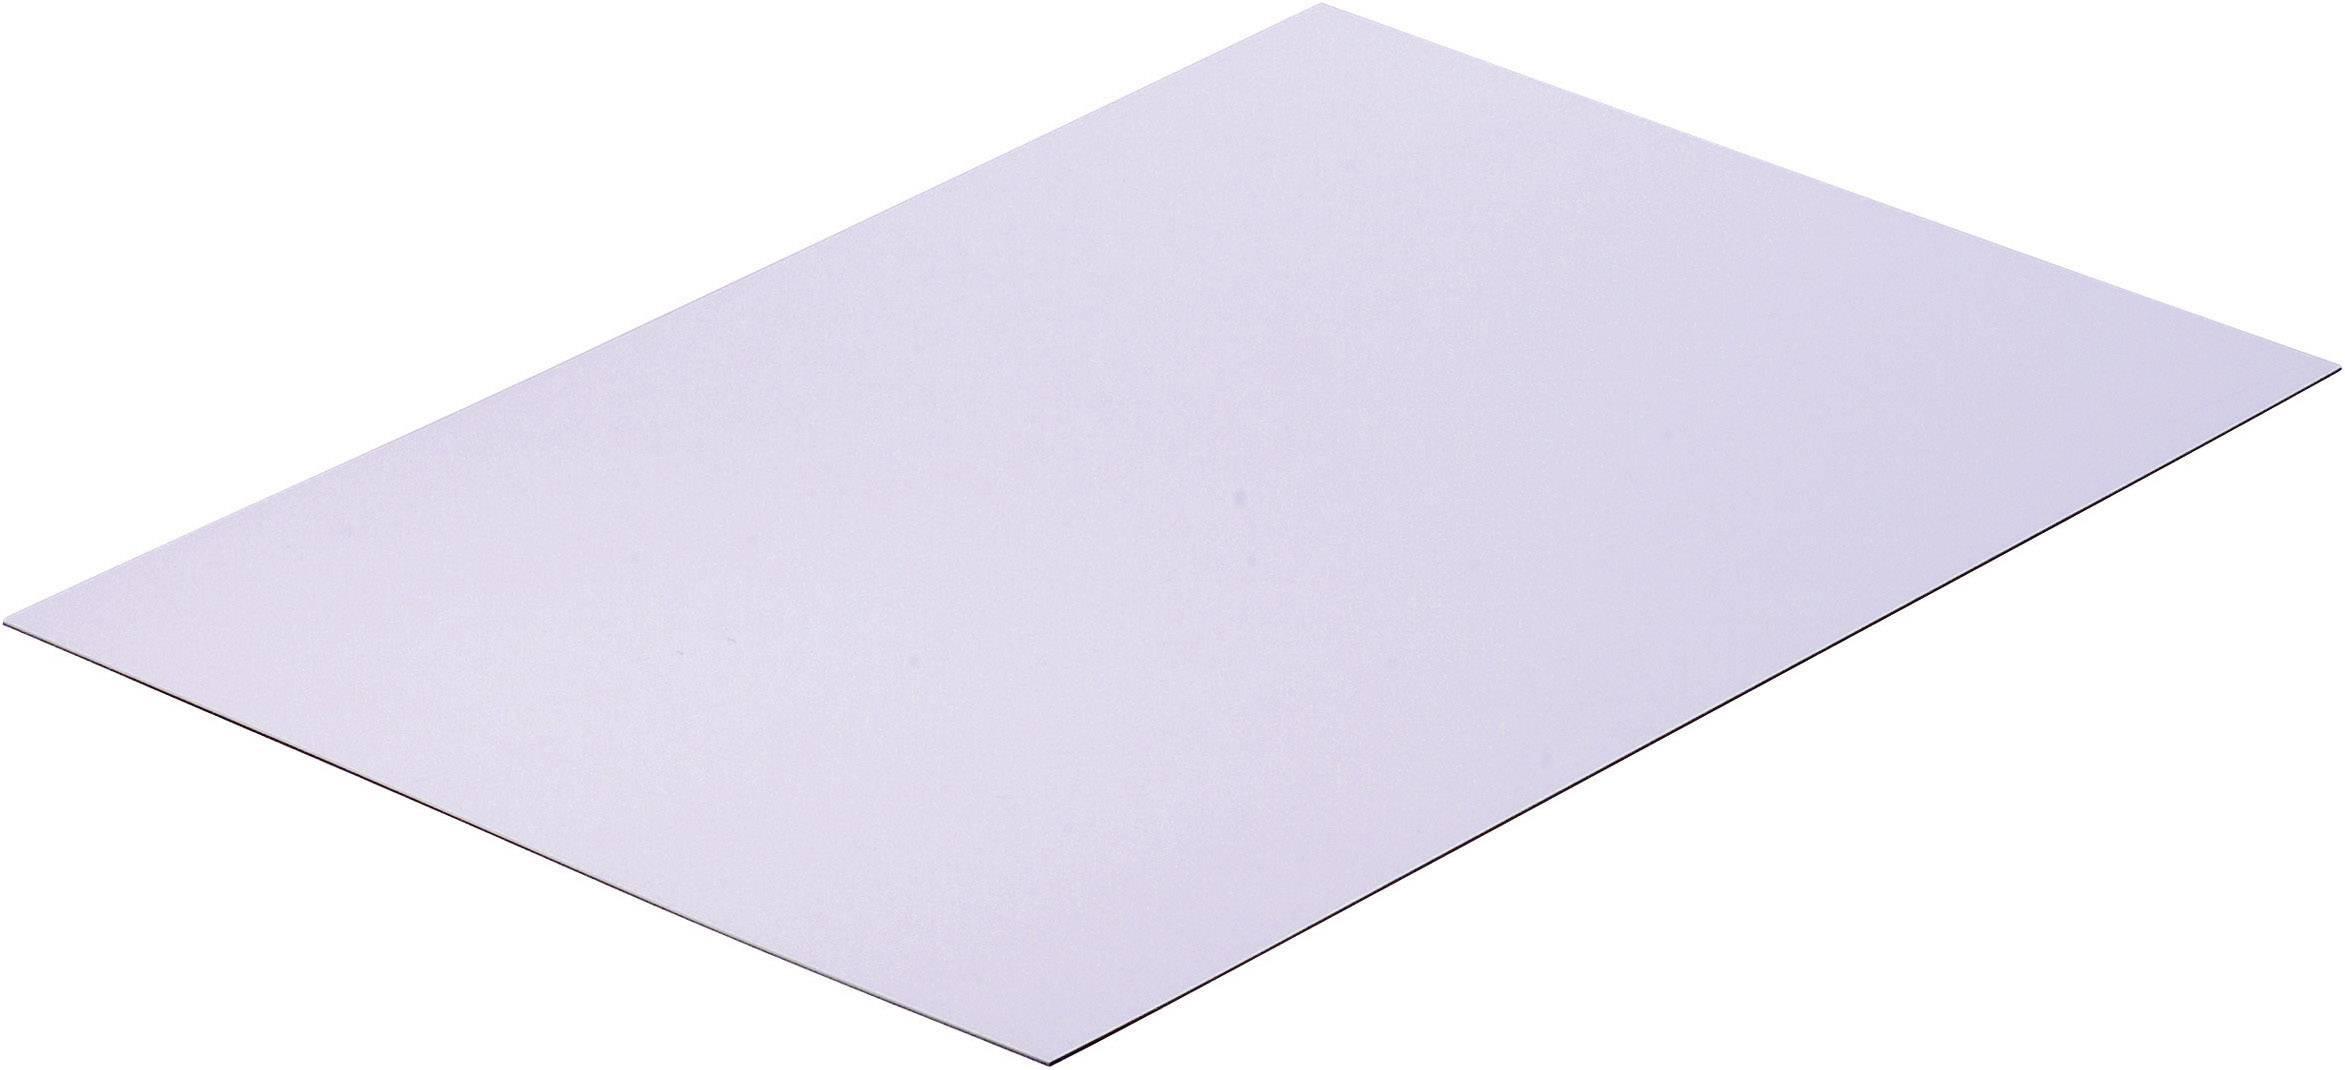 Polystyrenová deska bílá Modelcraft, 330 x 230 x 0,5 mm